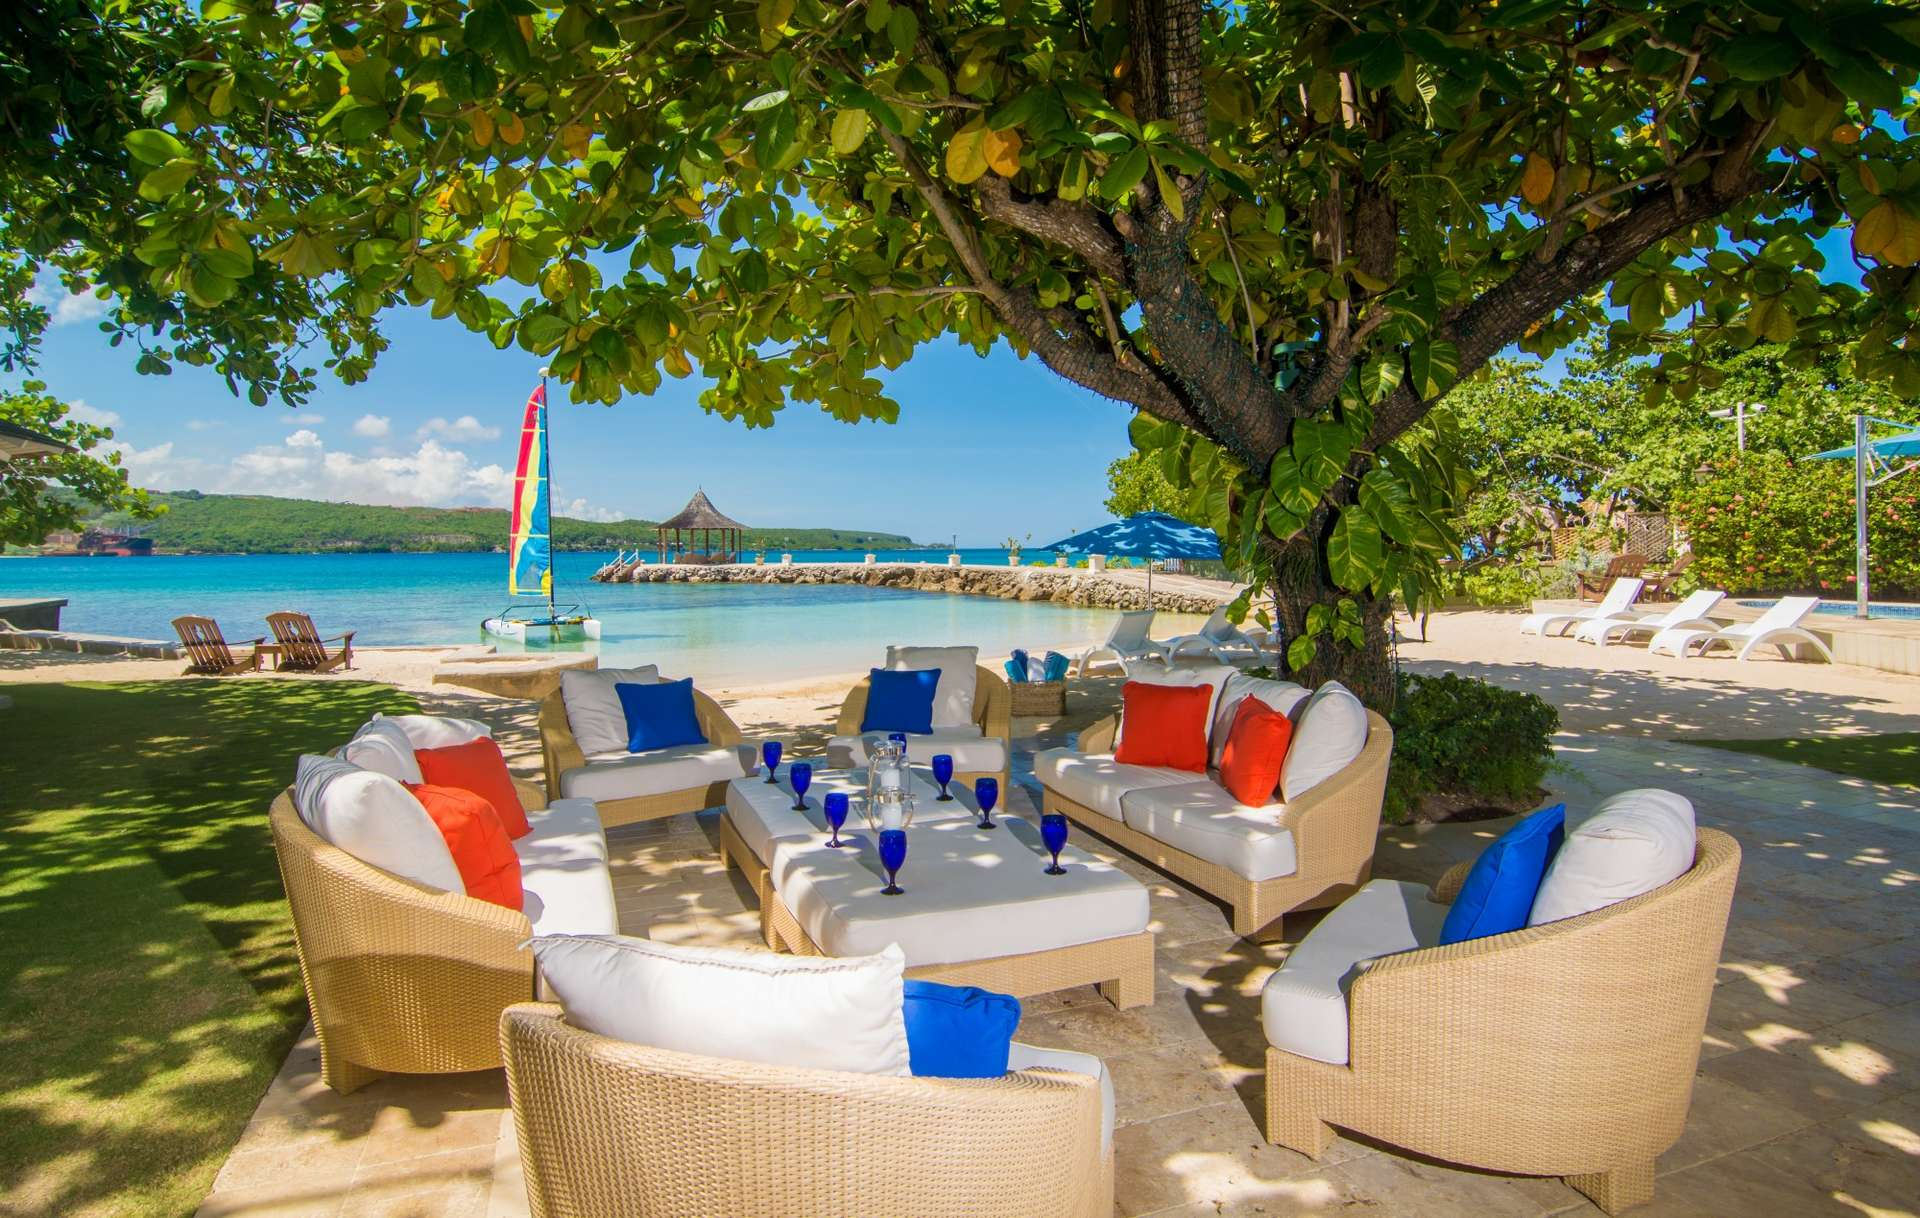 Luxury villa rentals caribbean - Jamaica - Discovery bay - Sundown - Image 1/28